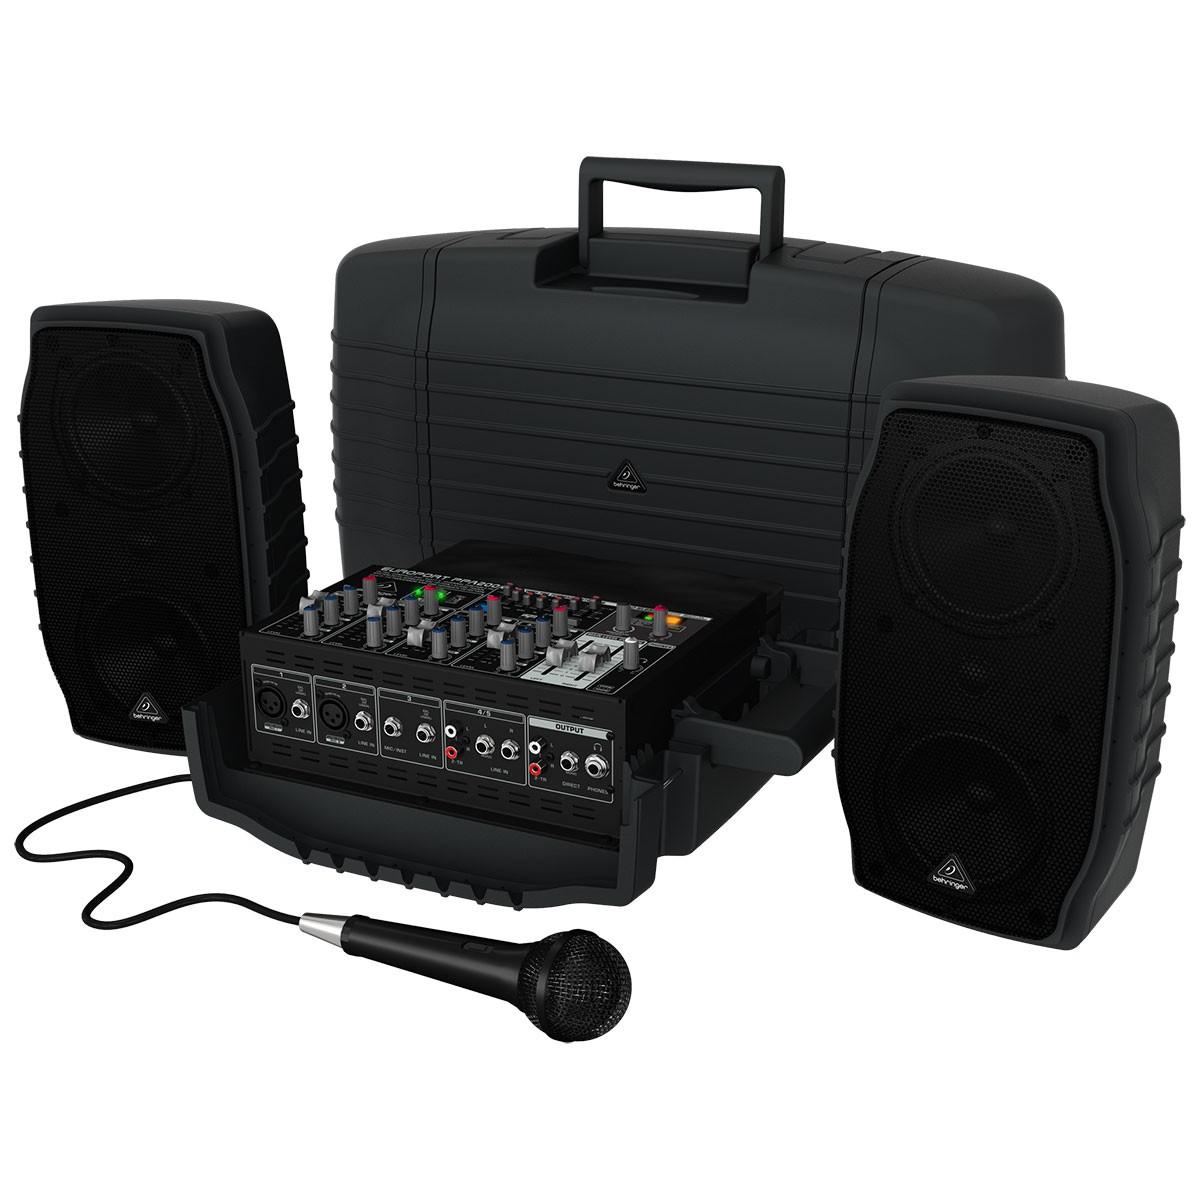 Small Portable Pa System : ultra compact portable pa system the school locker ~ Hamham.info Haus und Dekorationen